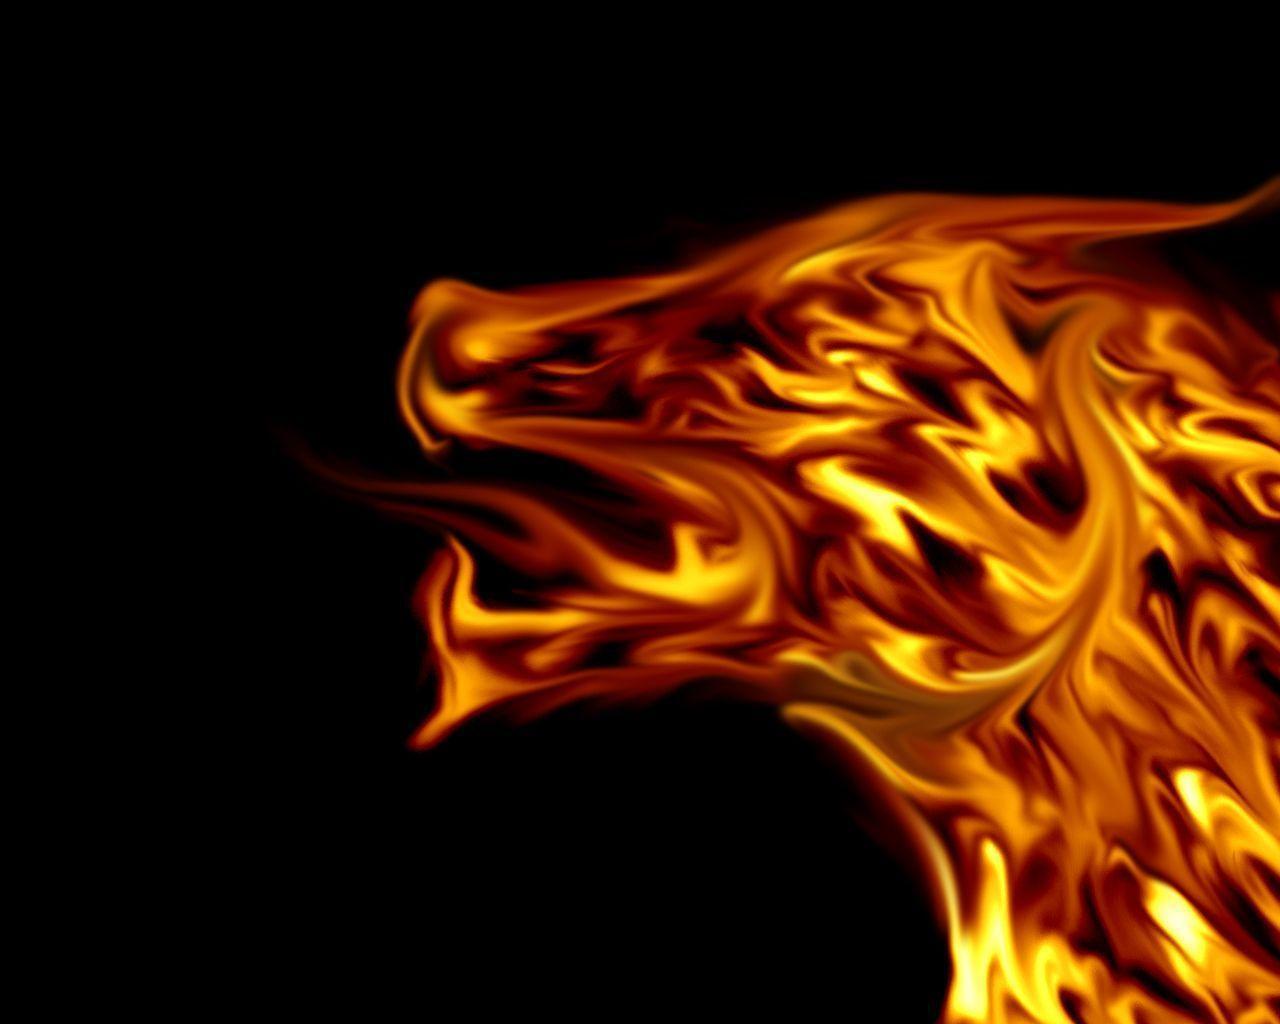 DREAM ZONE: Fire HD Wallpapers